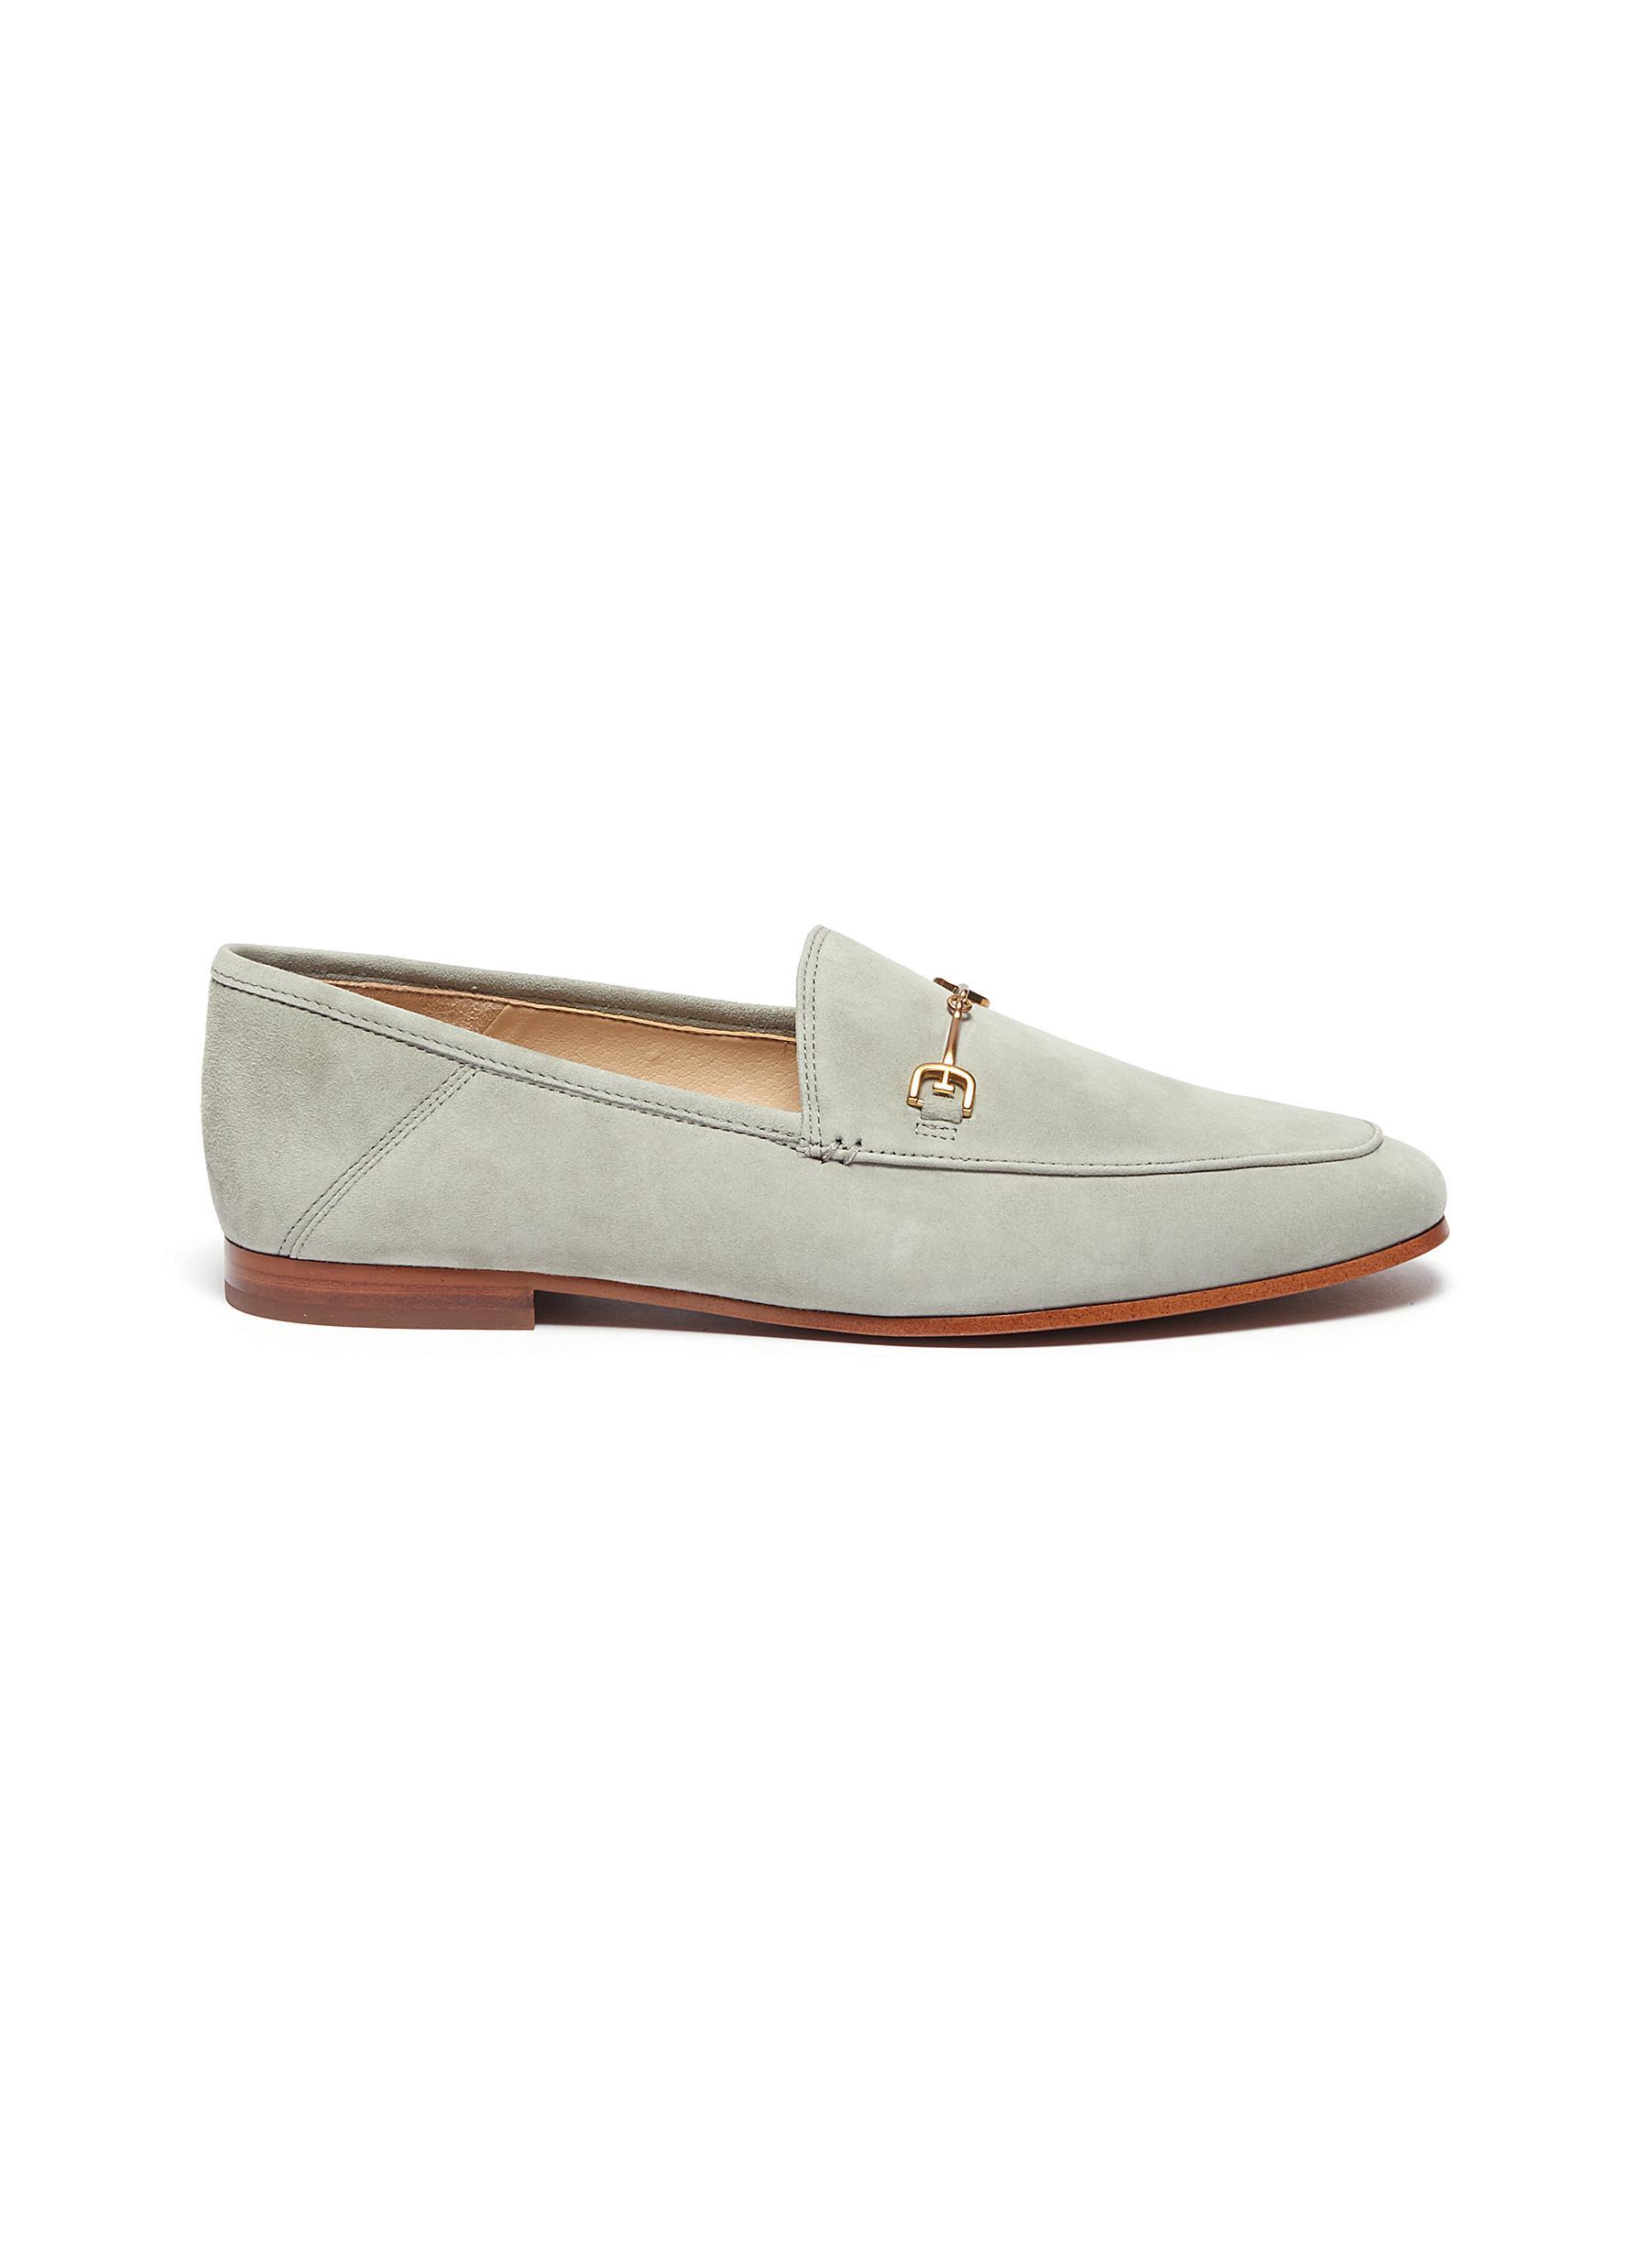 Sam Edelman Flats Loraine horsebit suede step-in loafers